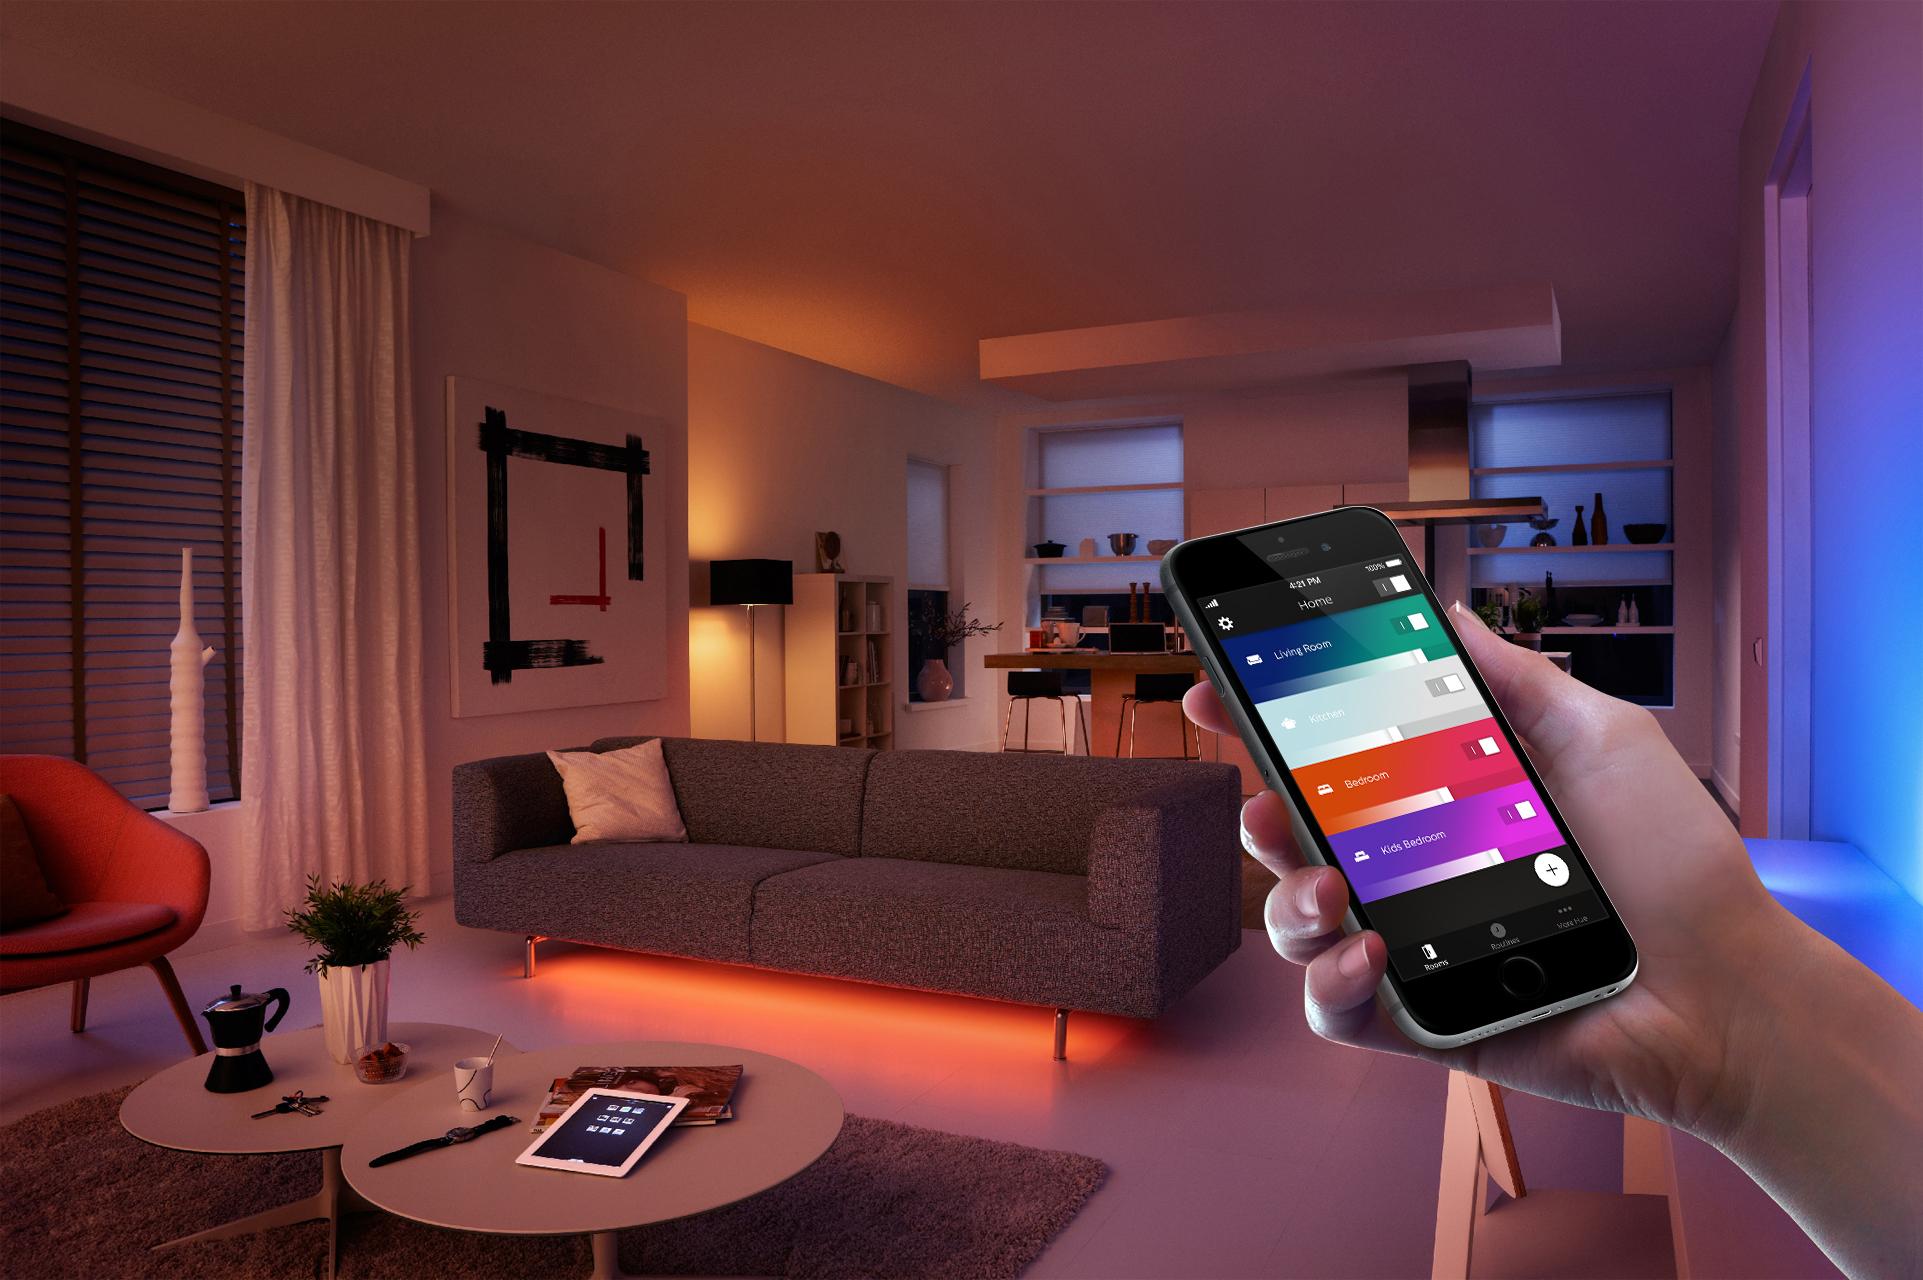 Starten Philips Hue : Neue philips hue app macht beleuchtung intelligenter news center